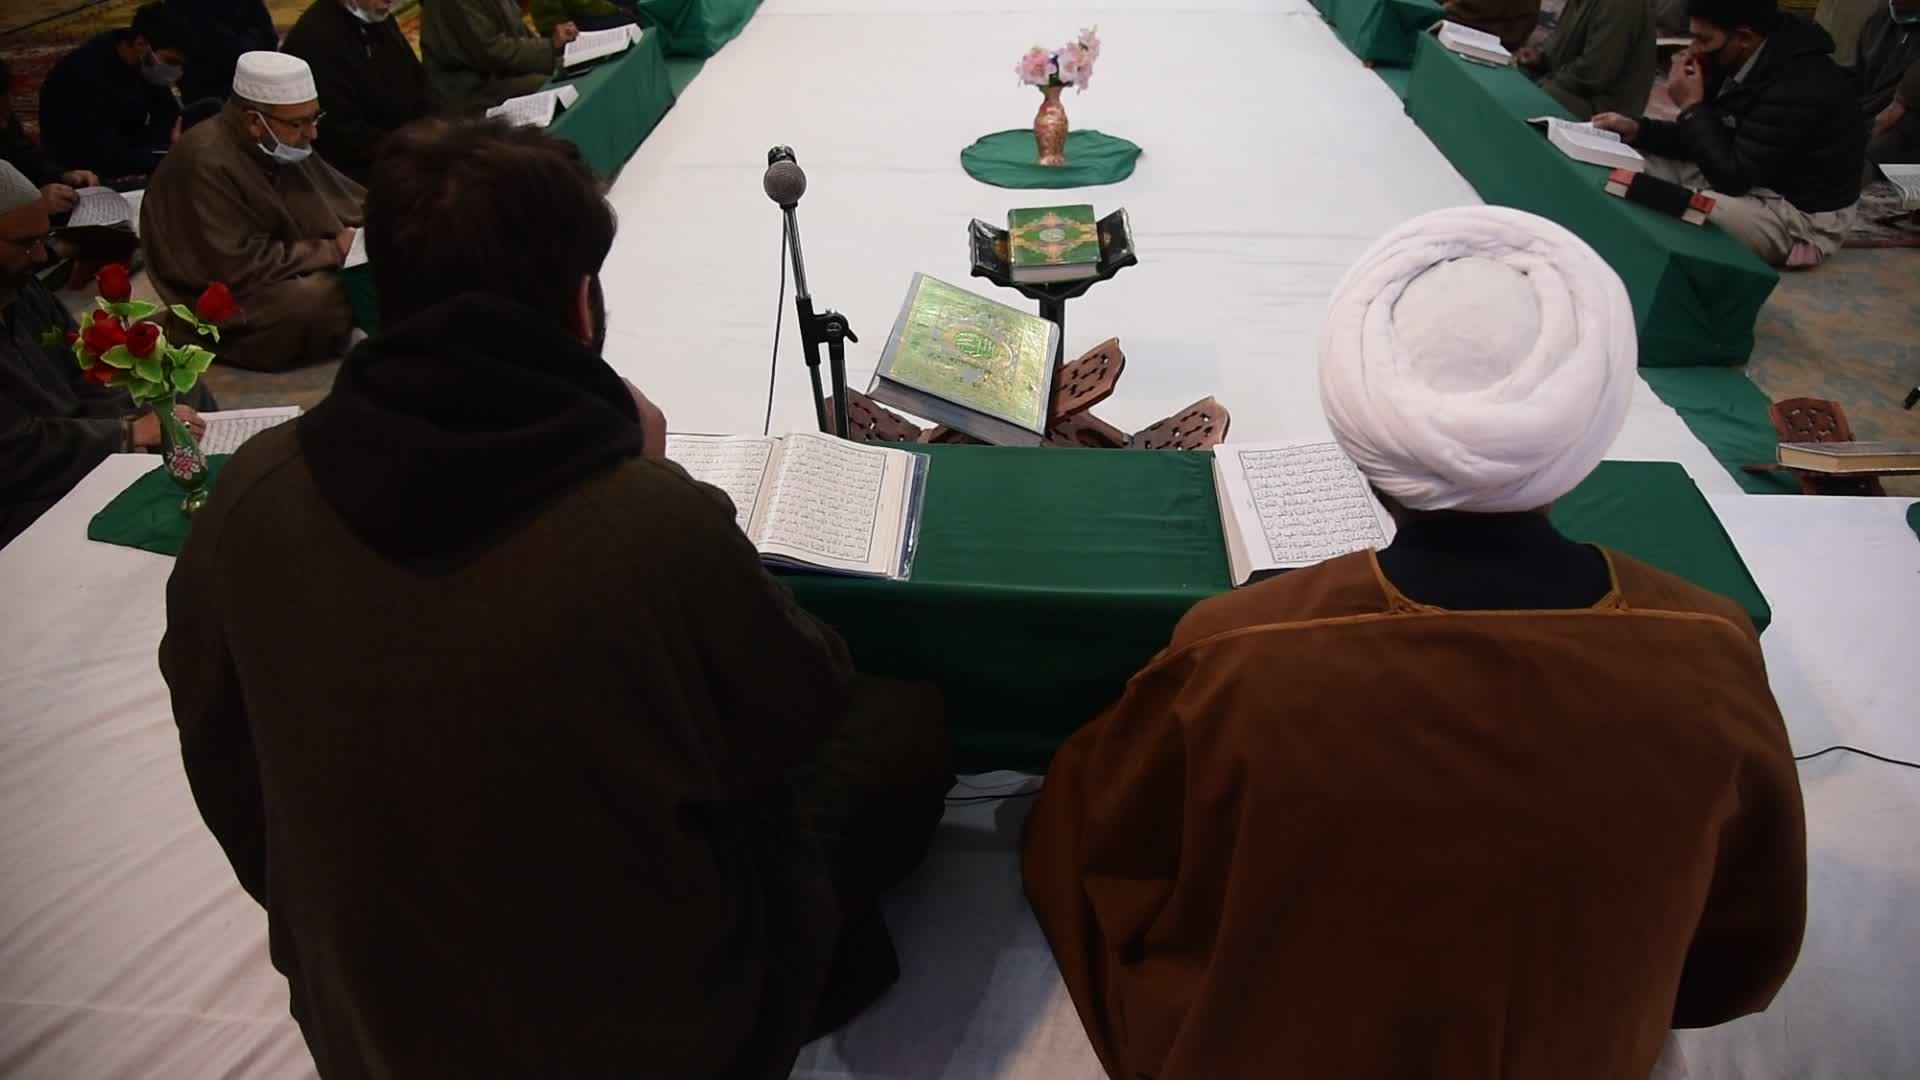 Ramadan in Srinagar, India